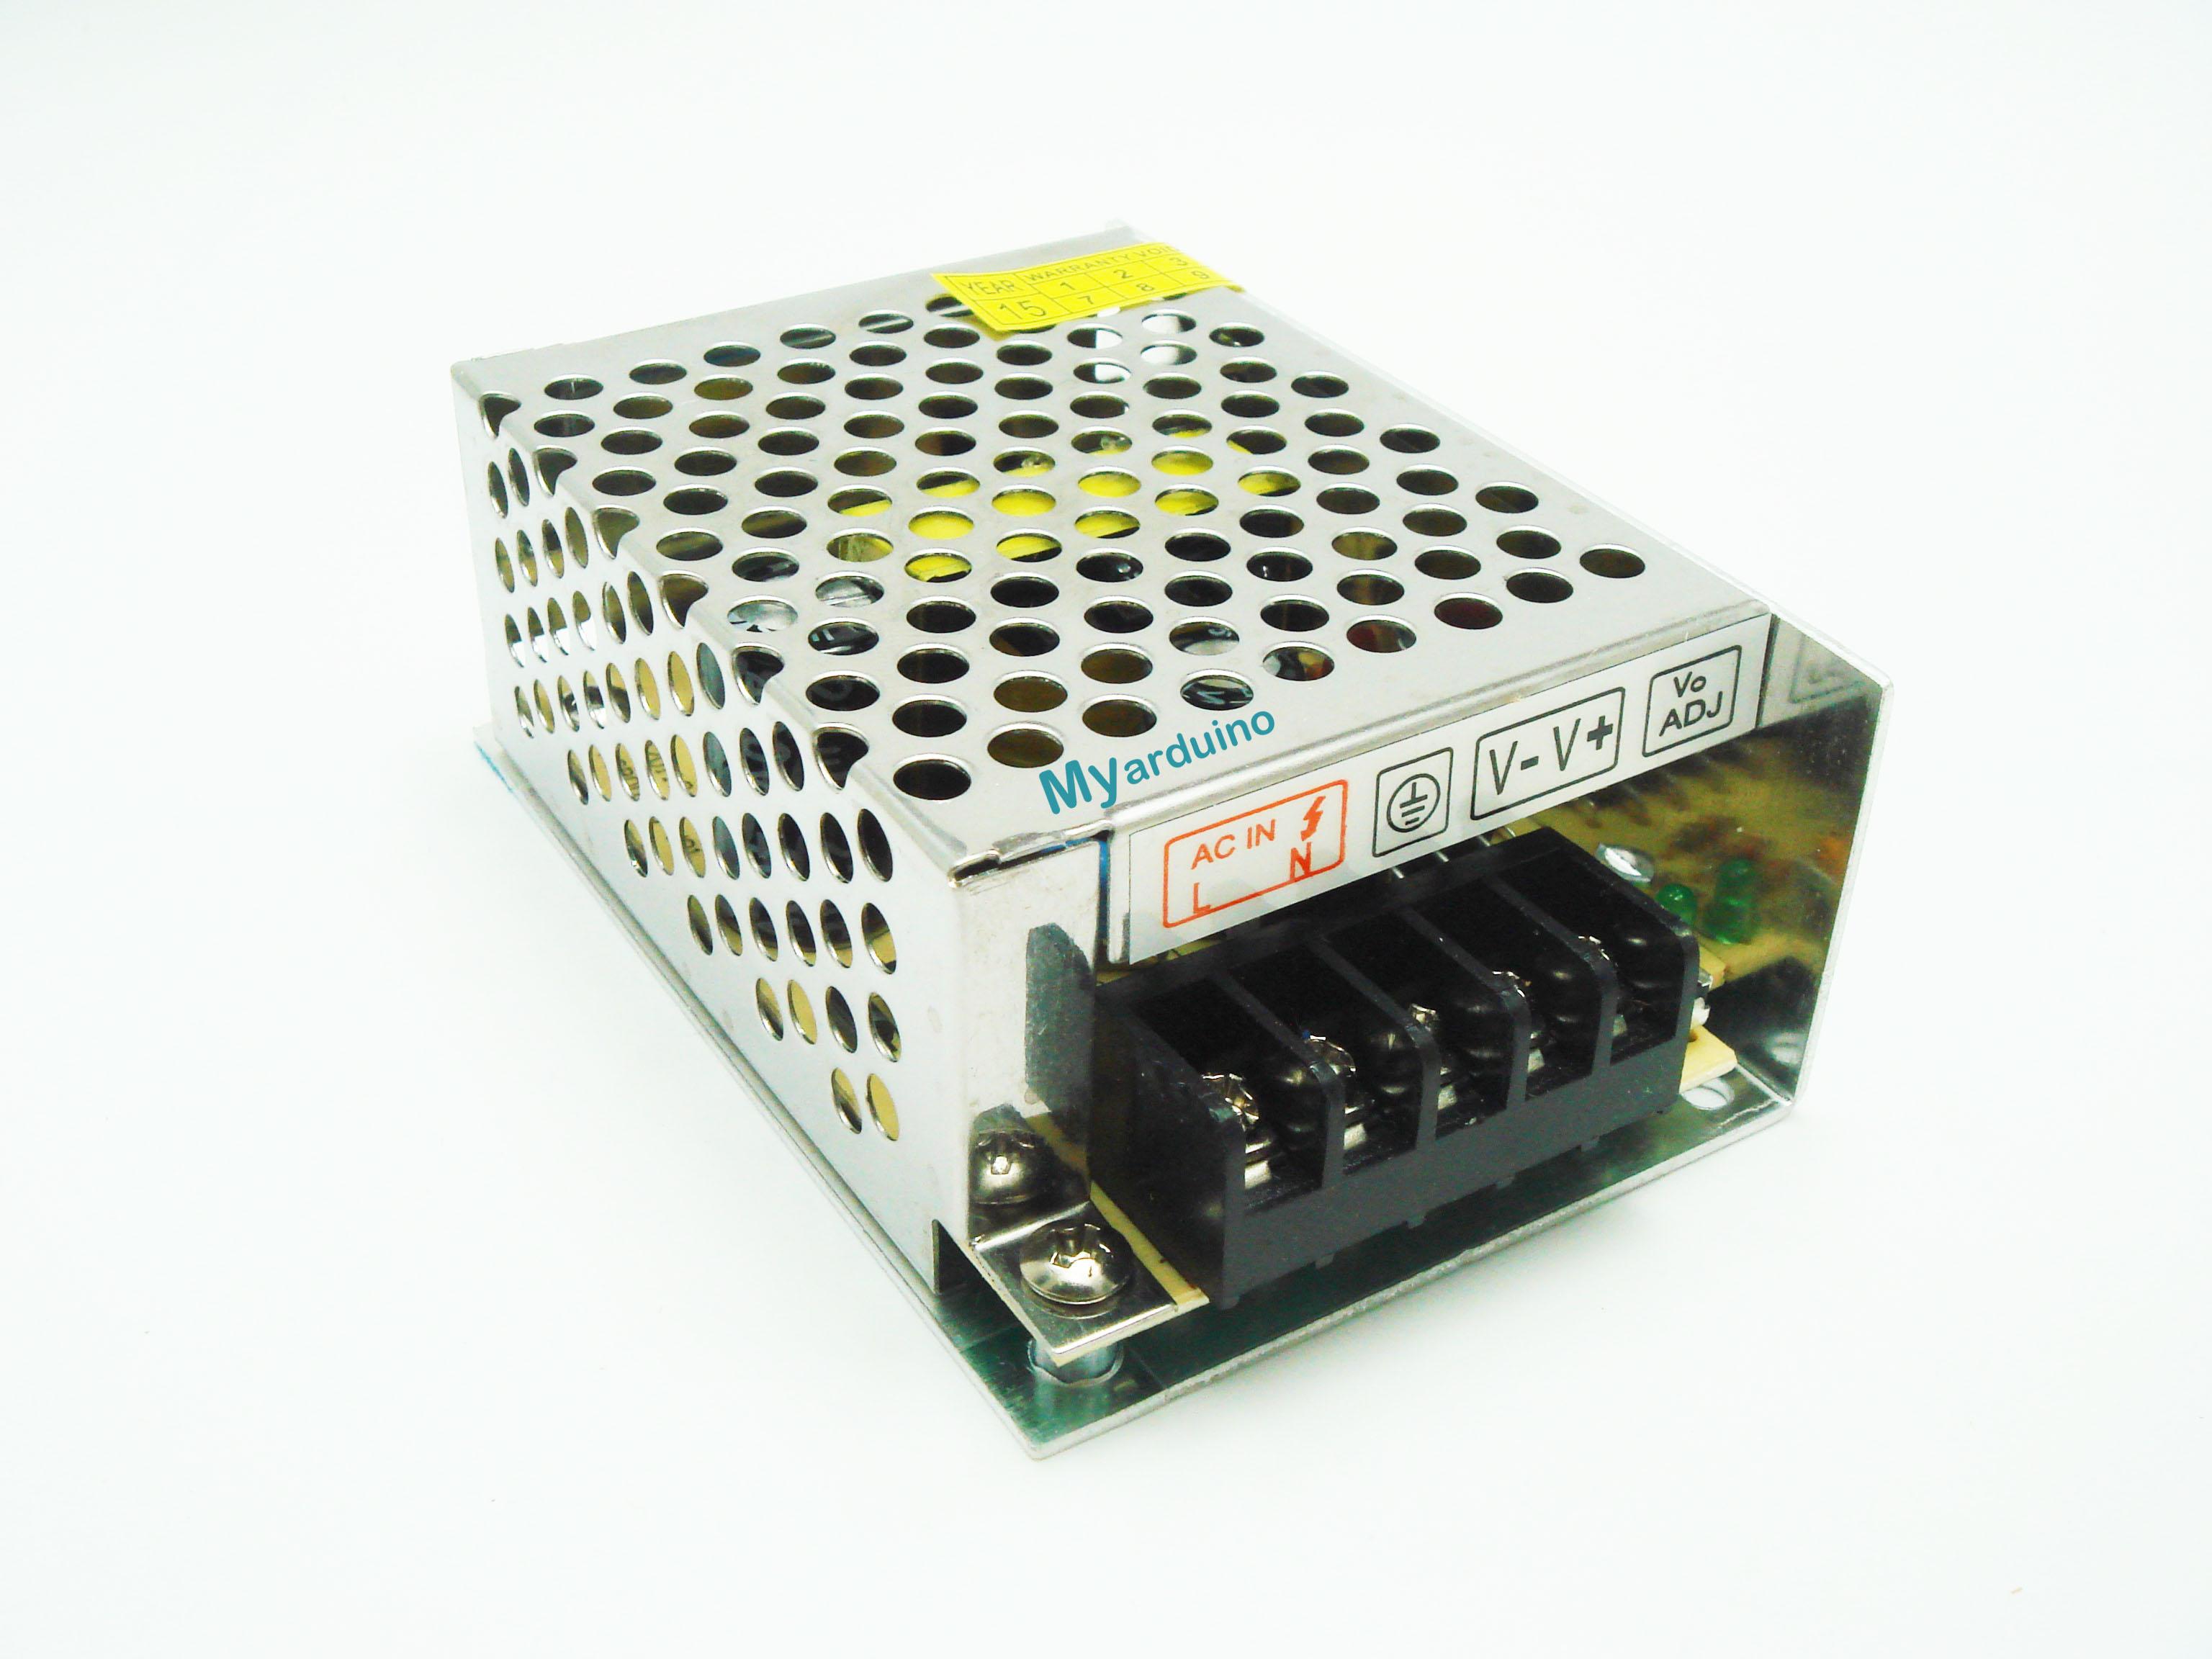 Switching Power supply แหล่งจ่ายไฟ 24V 1A